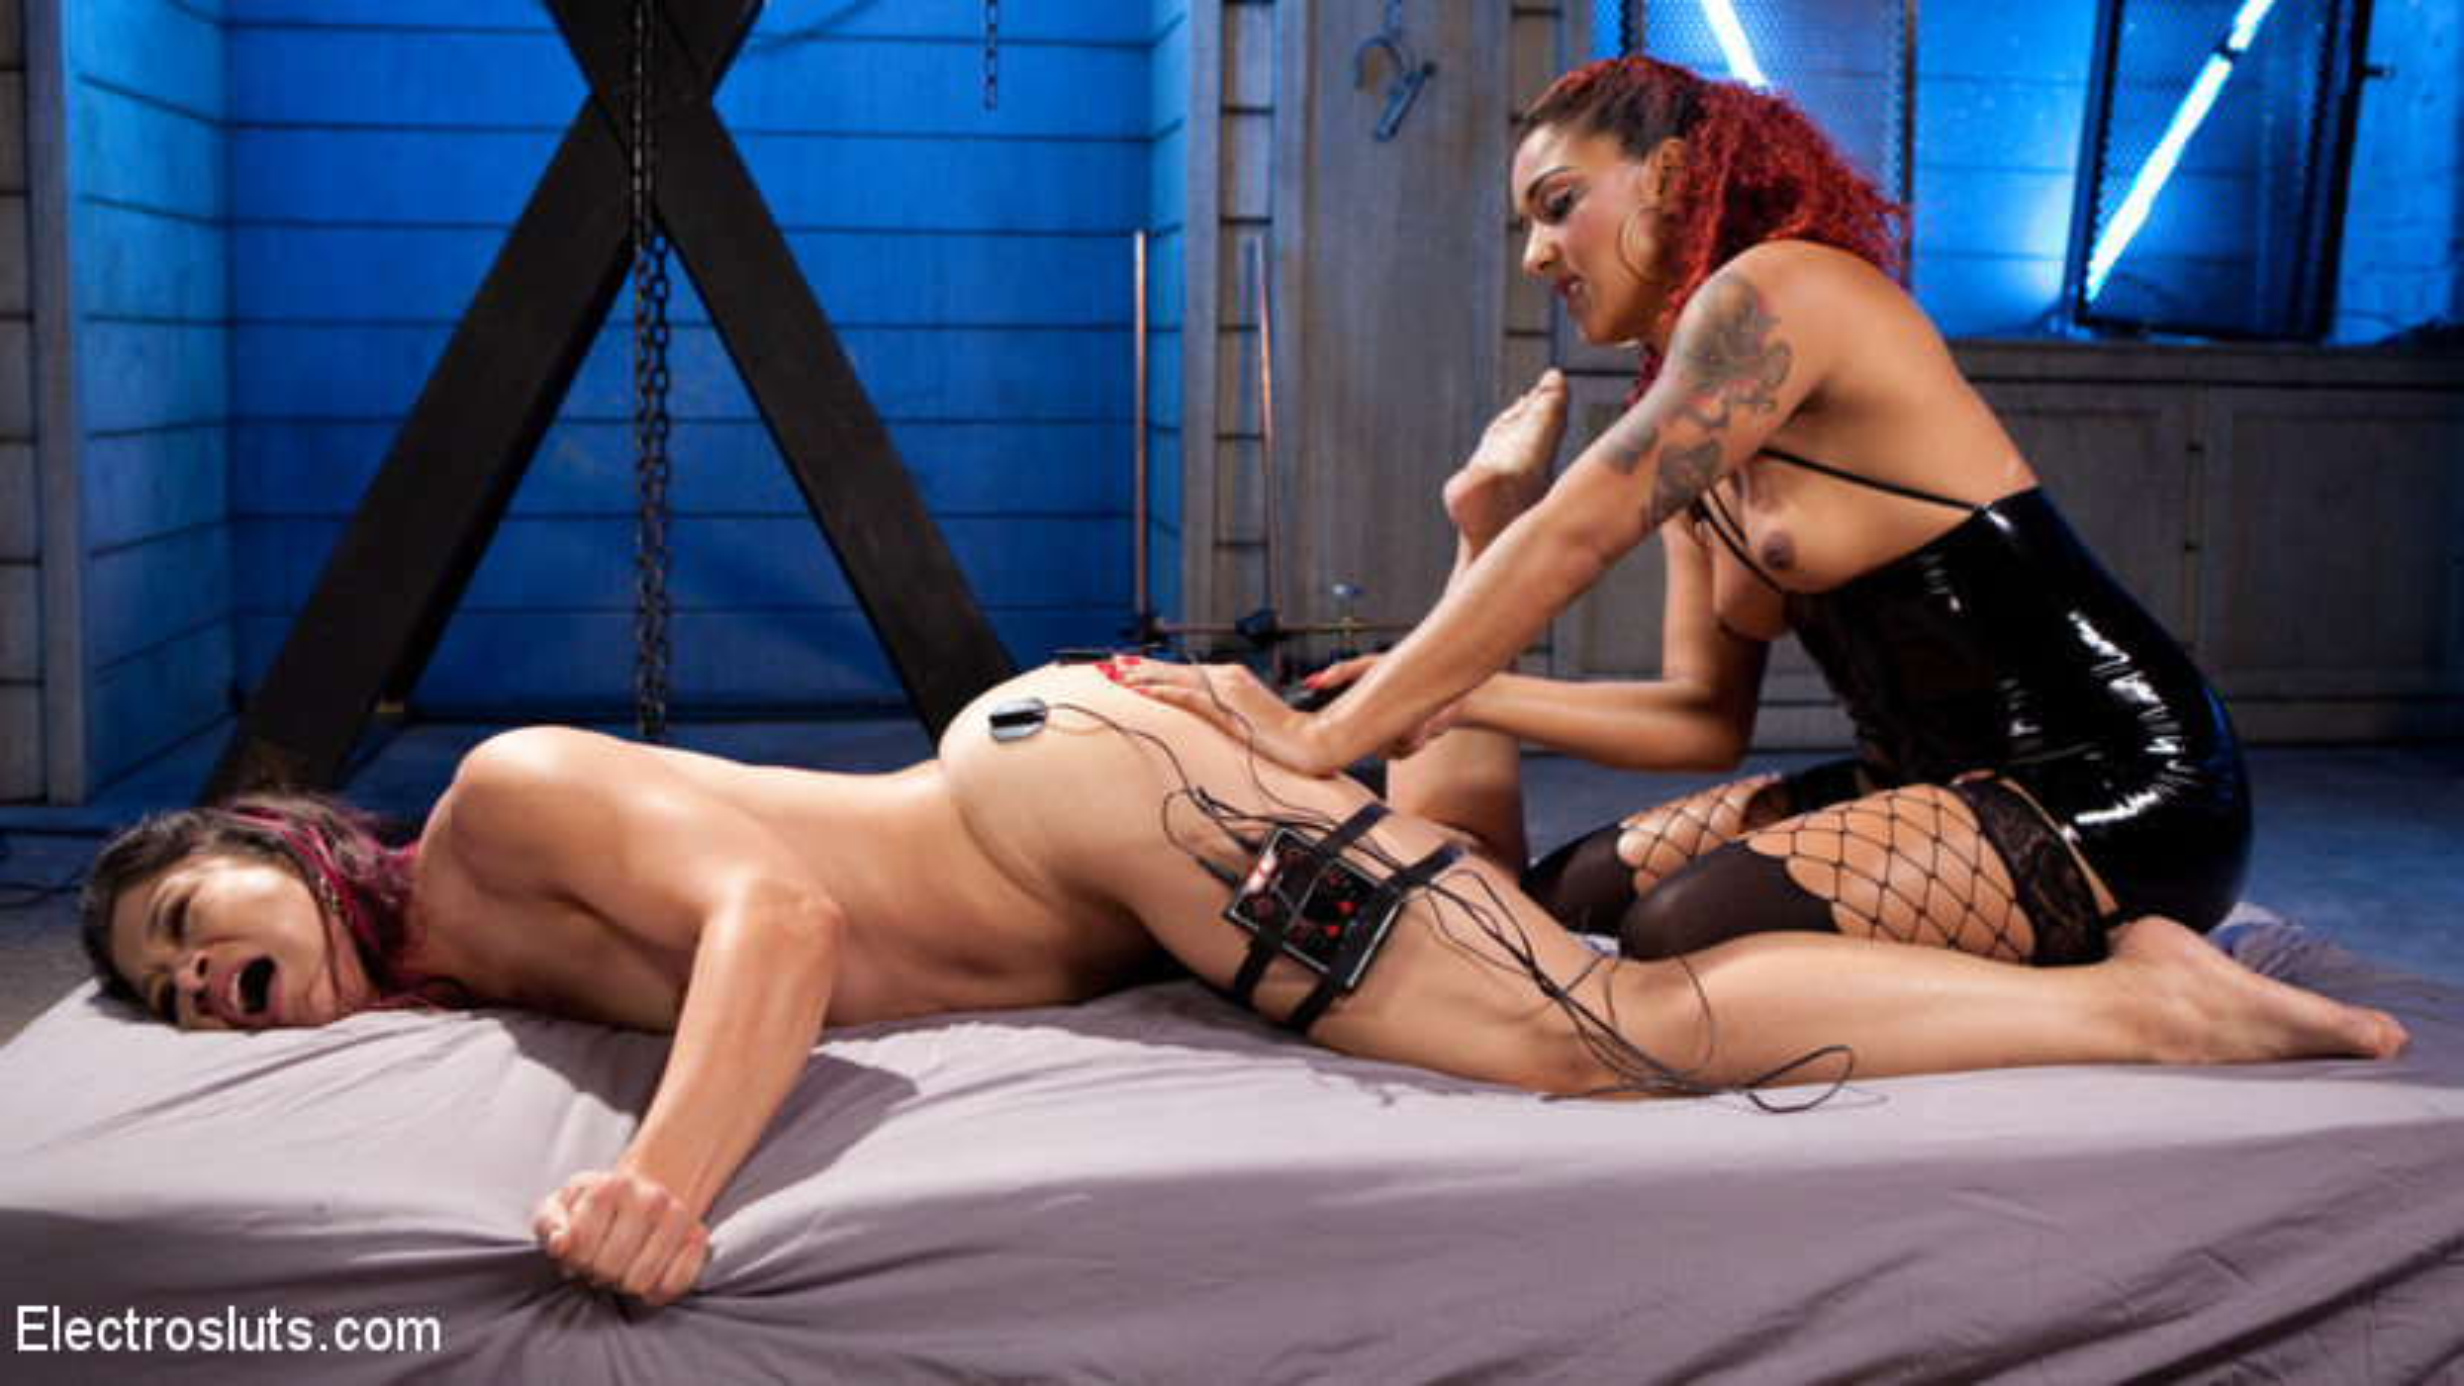 wrestling bondage dildo abend